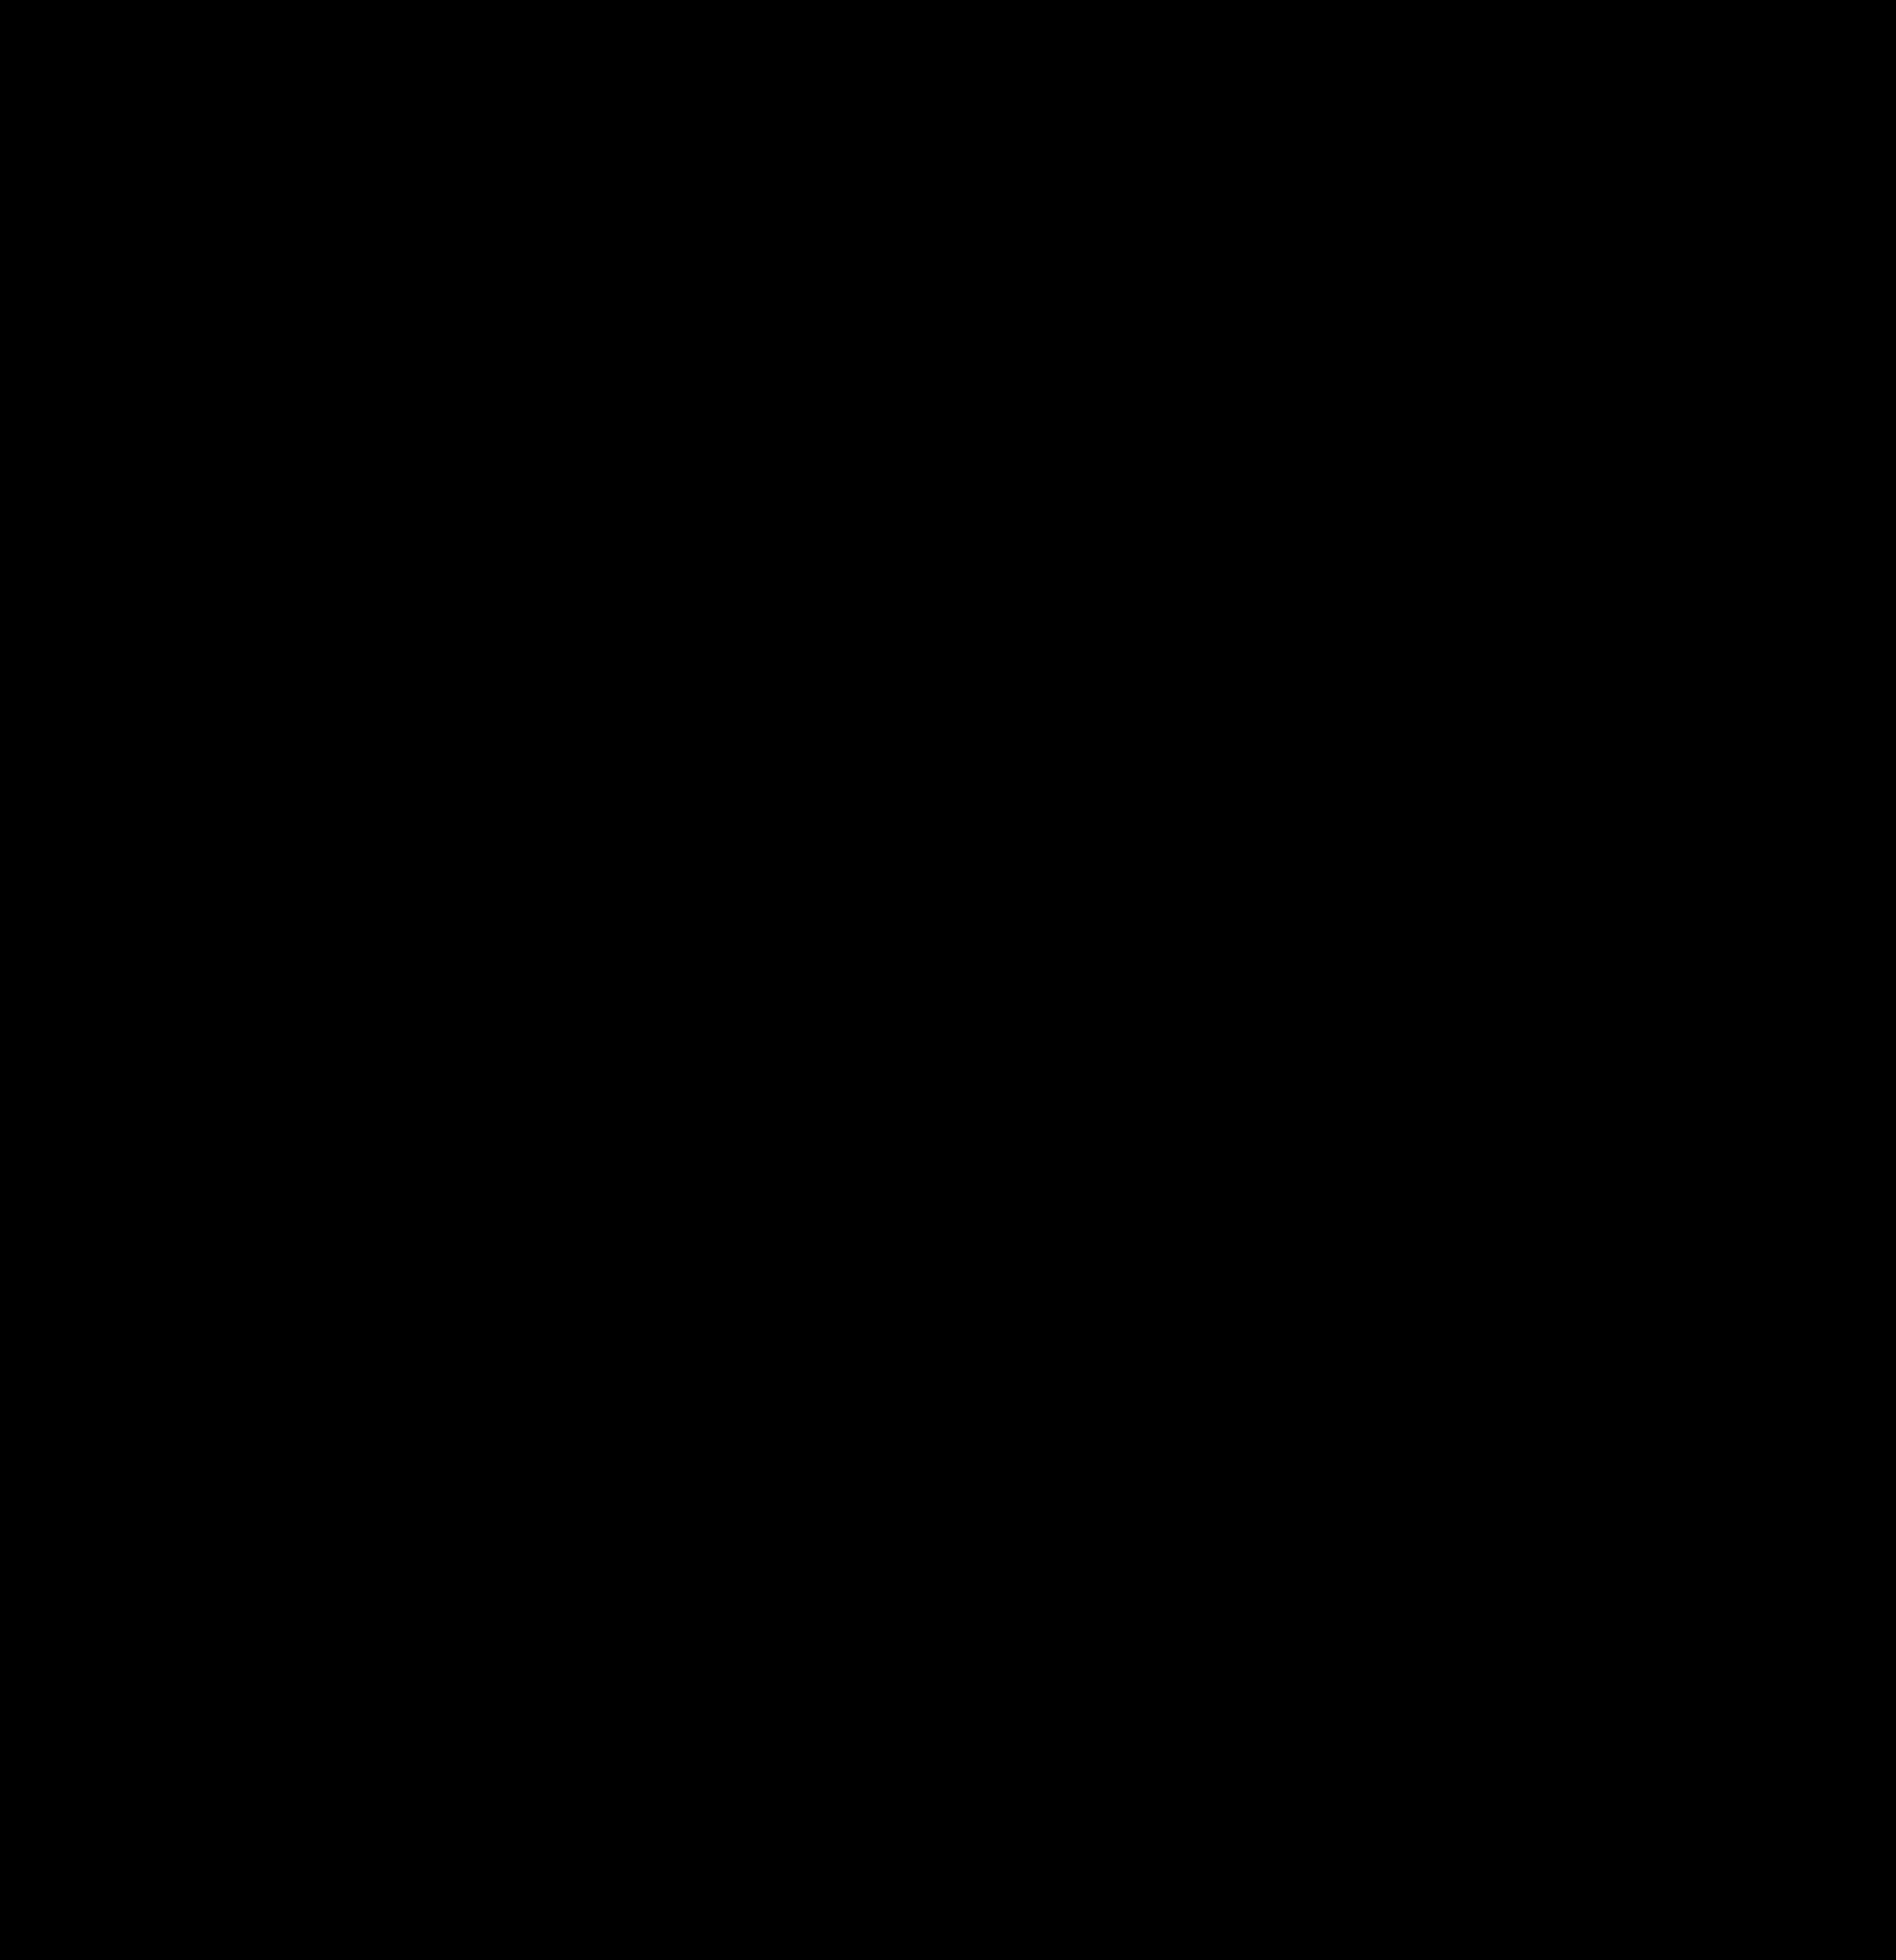 6 Grunge Bitcoin Logo (PNG Transparent) | OnlyGFX.com